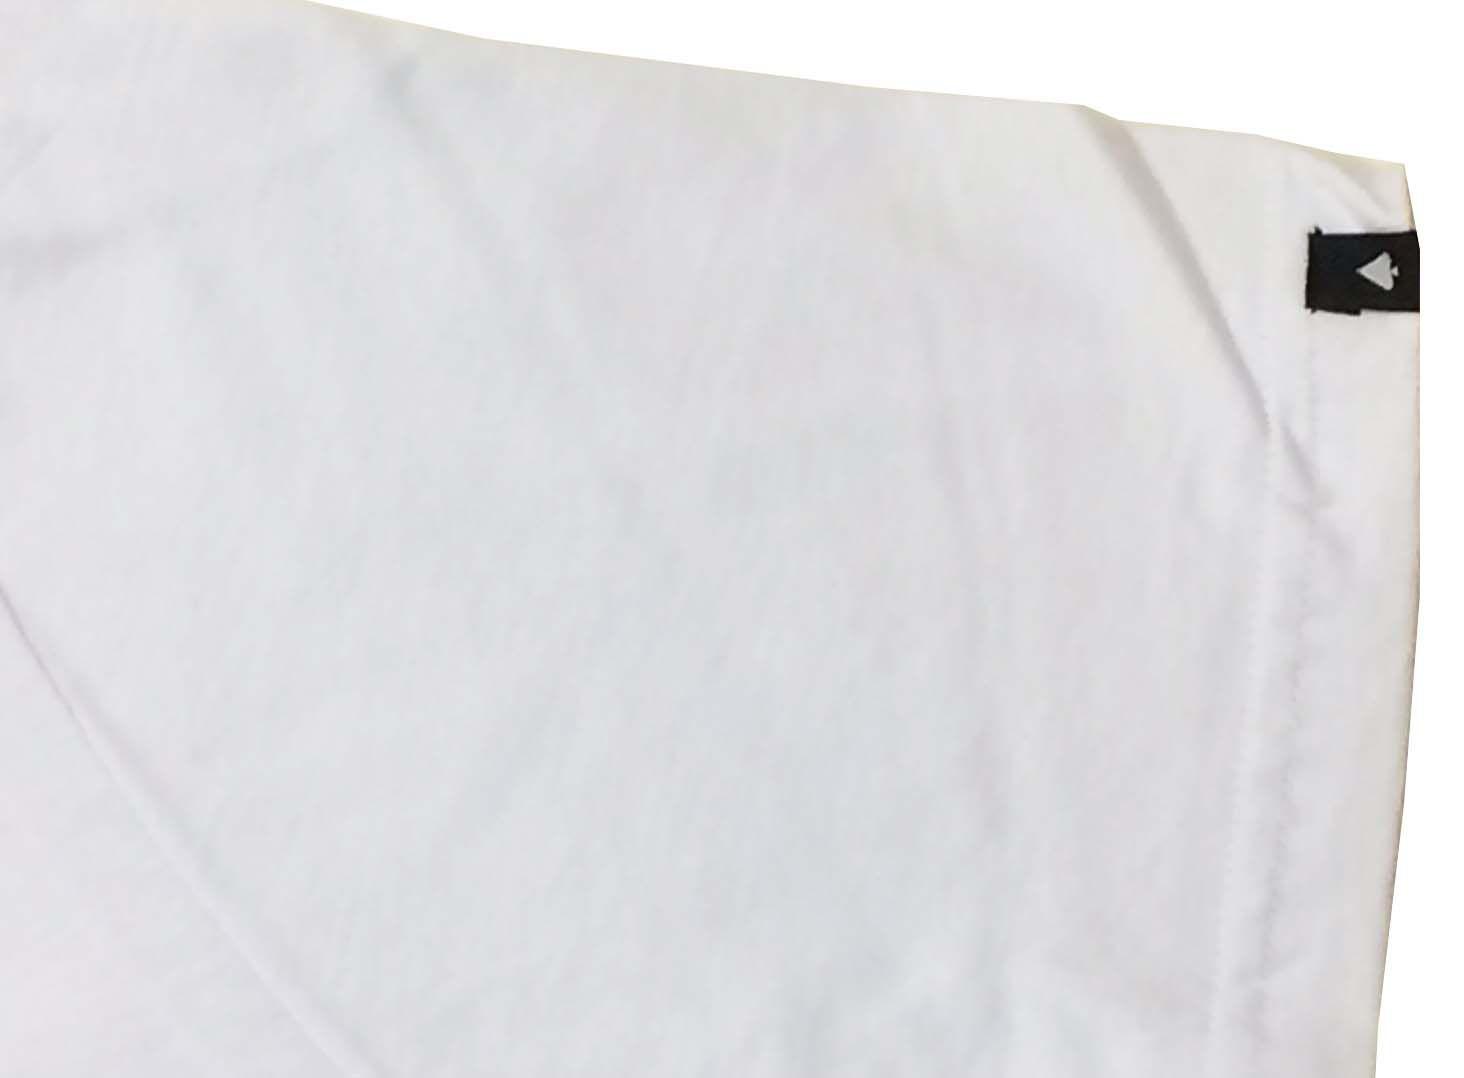 Camiseta Mcd Anjos 12022822 Masculina Branca